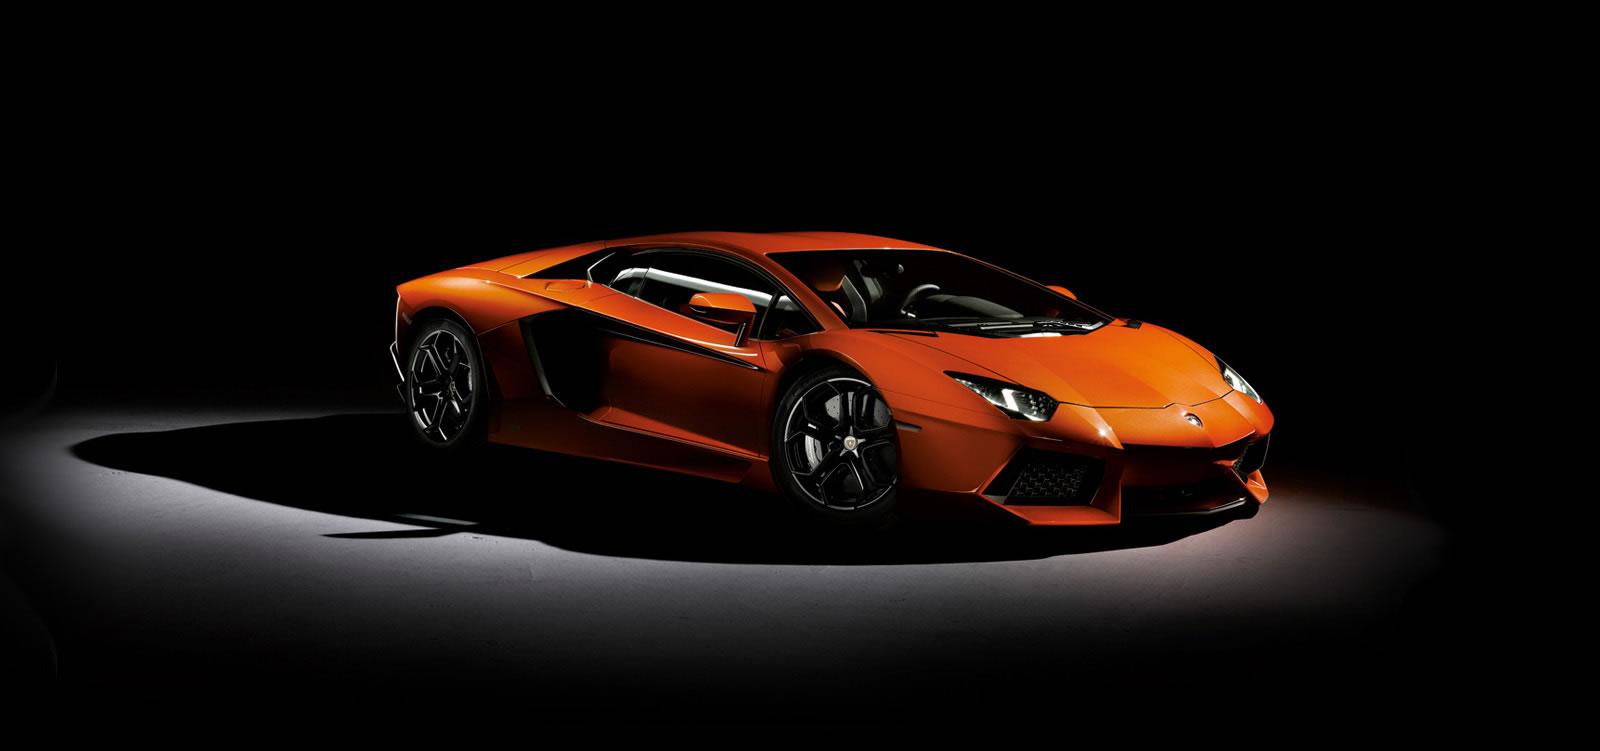 Lamborghini Aventador LP 700 4 Fastest Fantasy Car